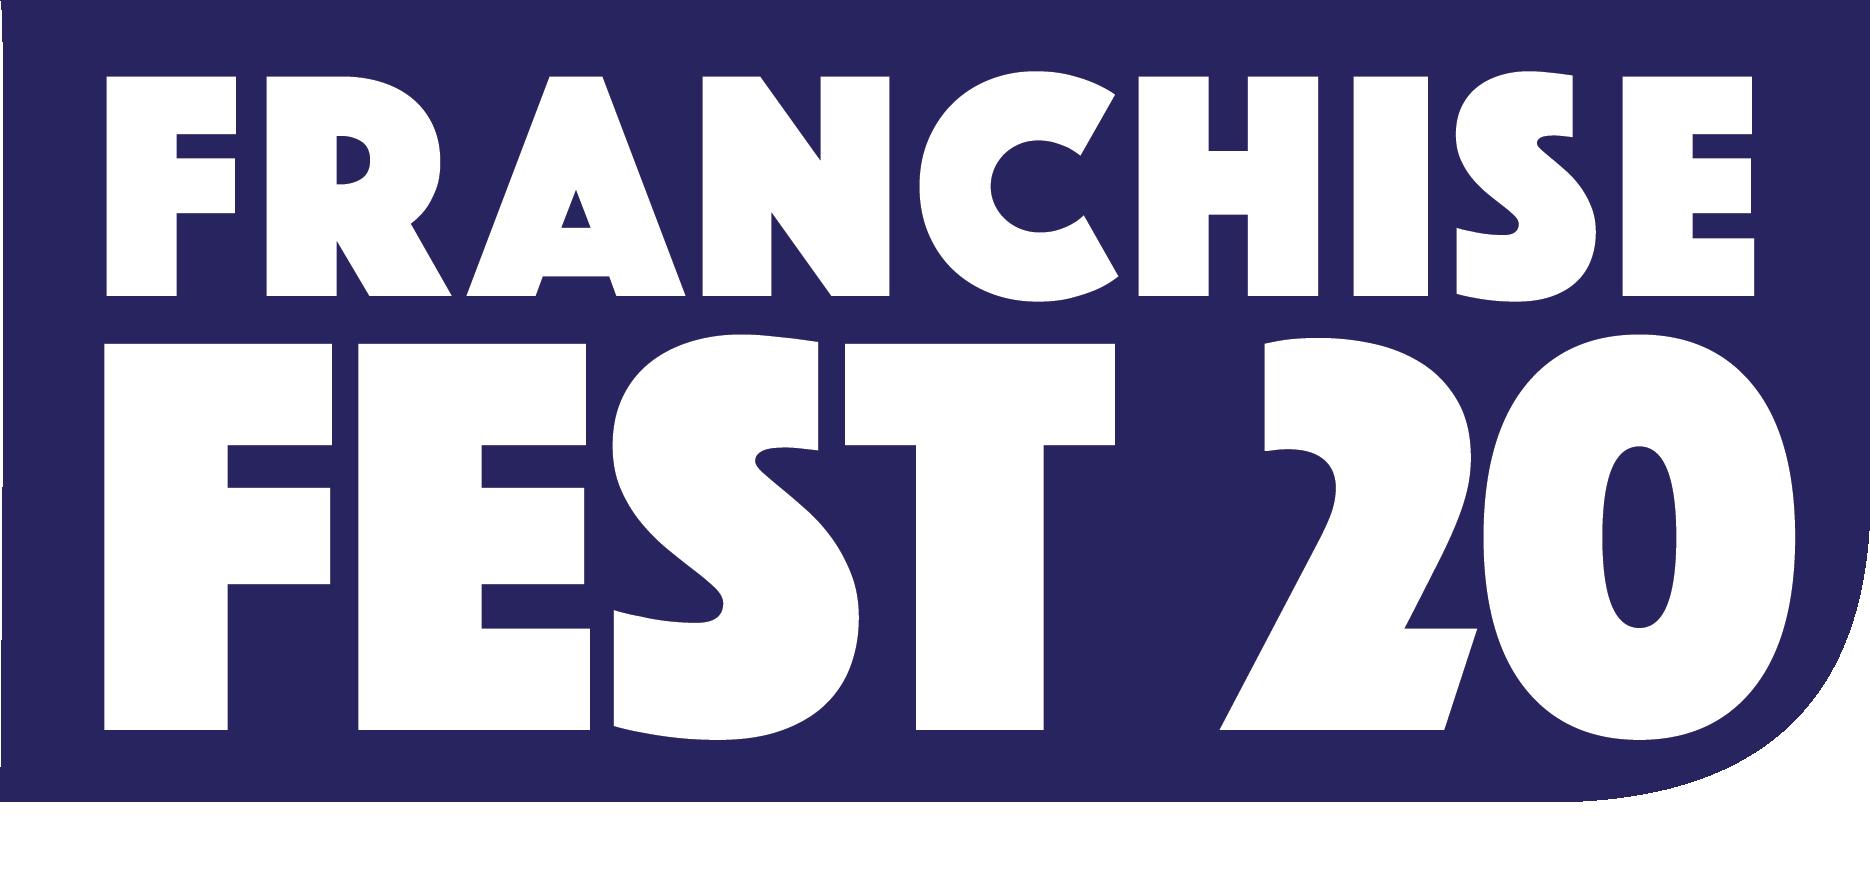 Franchise Fest 2020